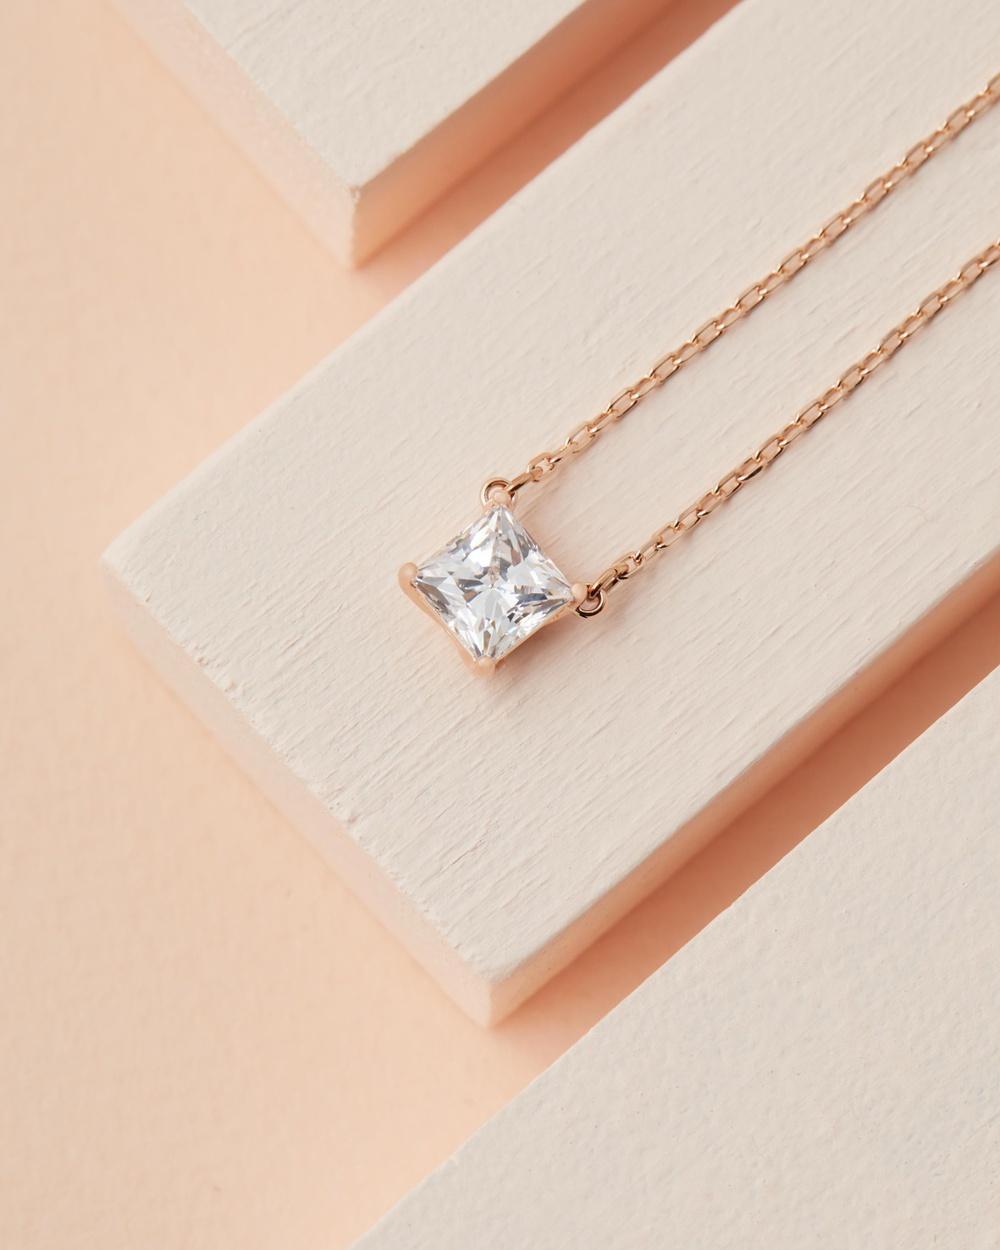 Swarovski Attract Necklace Jewellery Rose Gold